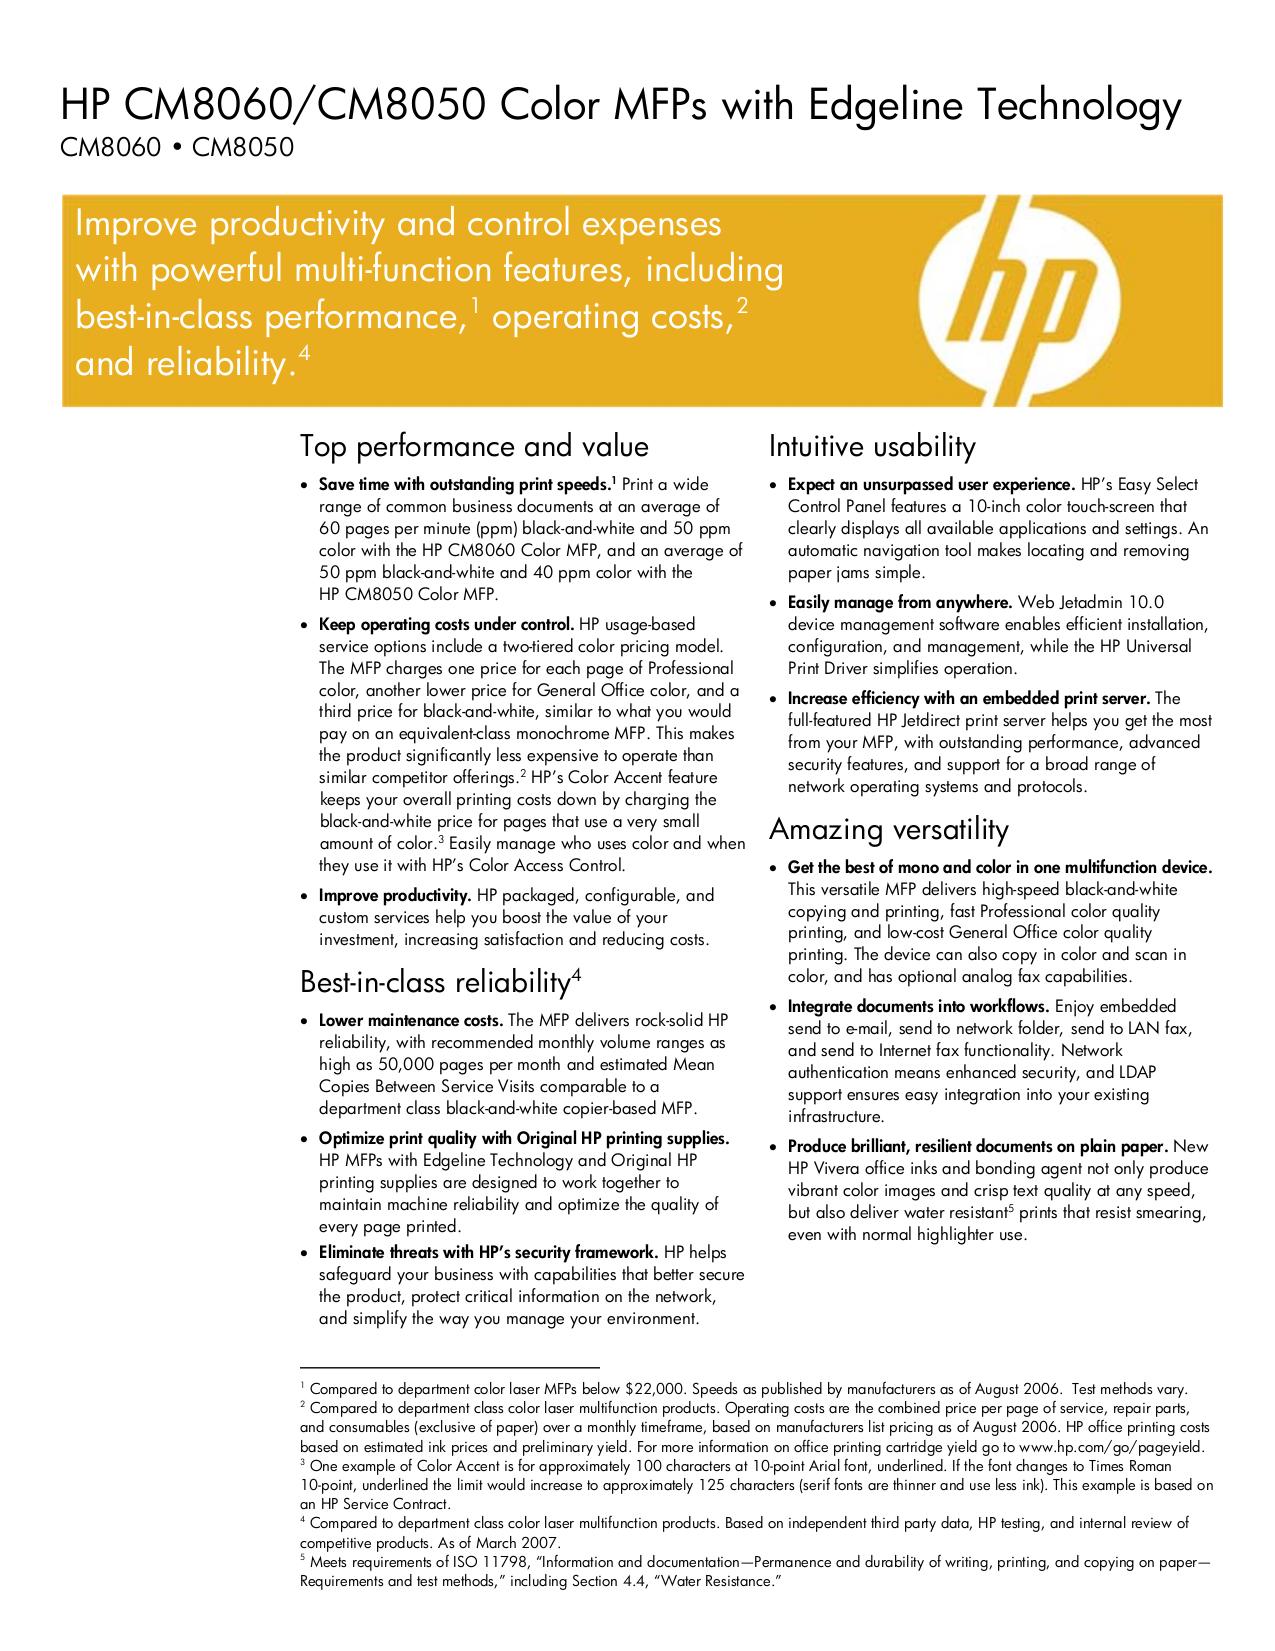 pdf for HP Multifunction Printer Laserjet,Color Laserjet CM8060 MFP manual